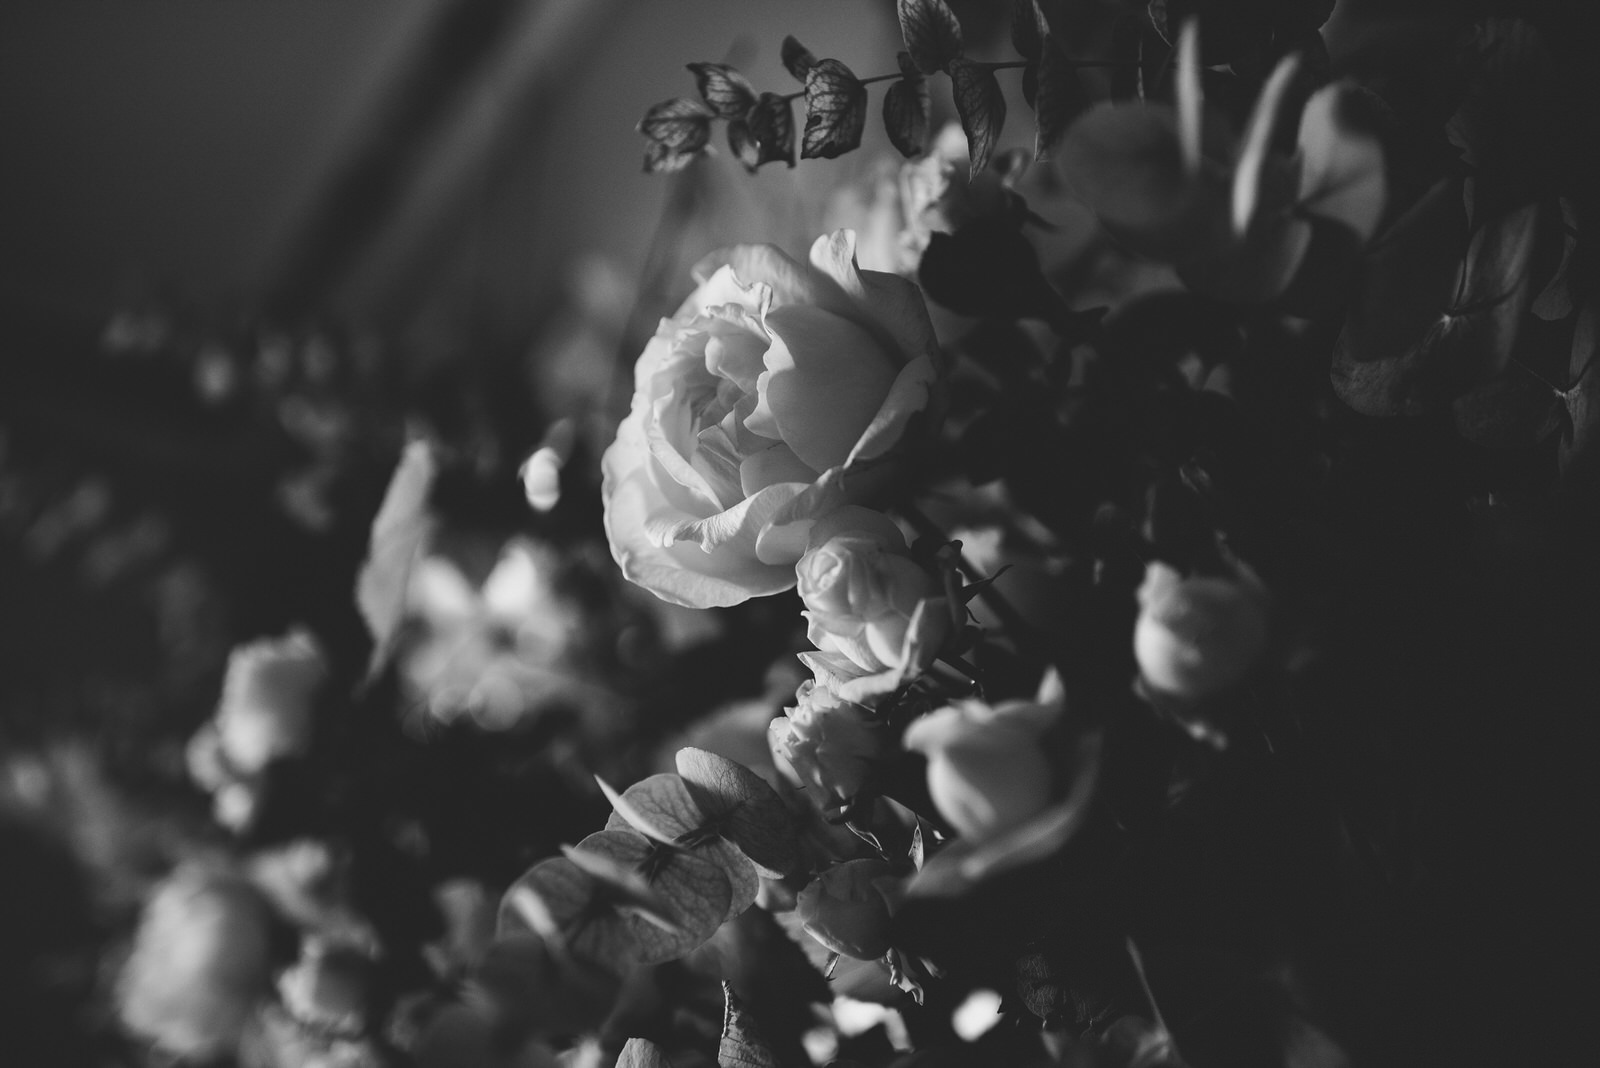 002-COLSTOUN-HOUSE-WEDDING-ALTERNATIVE-WEDDING-PHOTOGRAPHER-GLASGOW-WEDDING-PHOTOGRAPHER-STYLISH-SCOTTISH-WEDDING.JPG